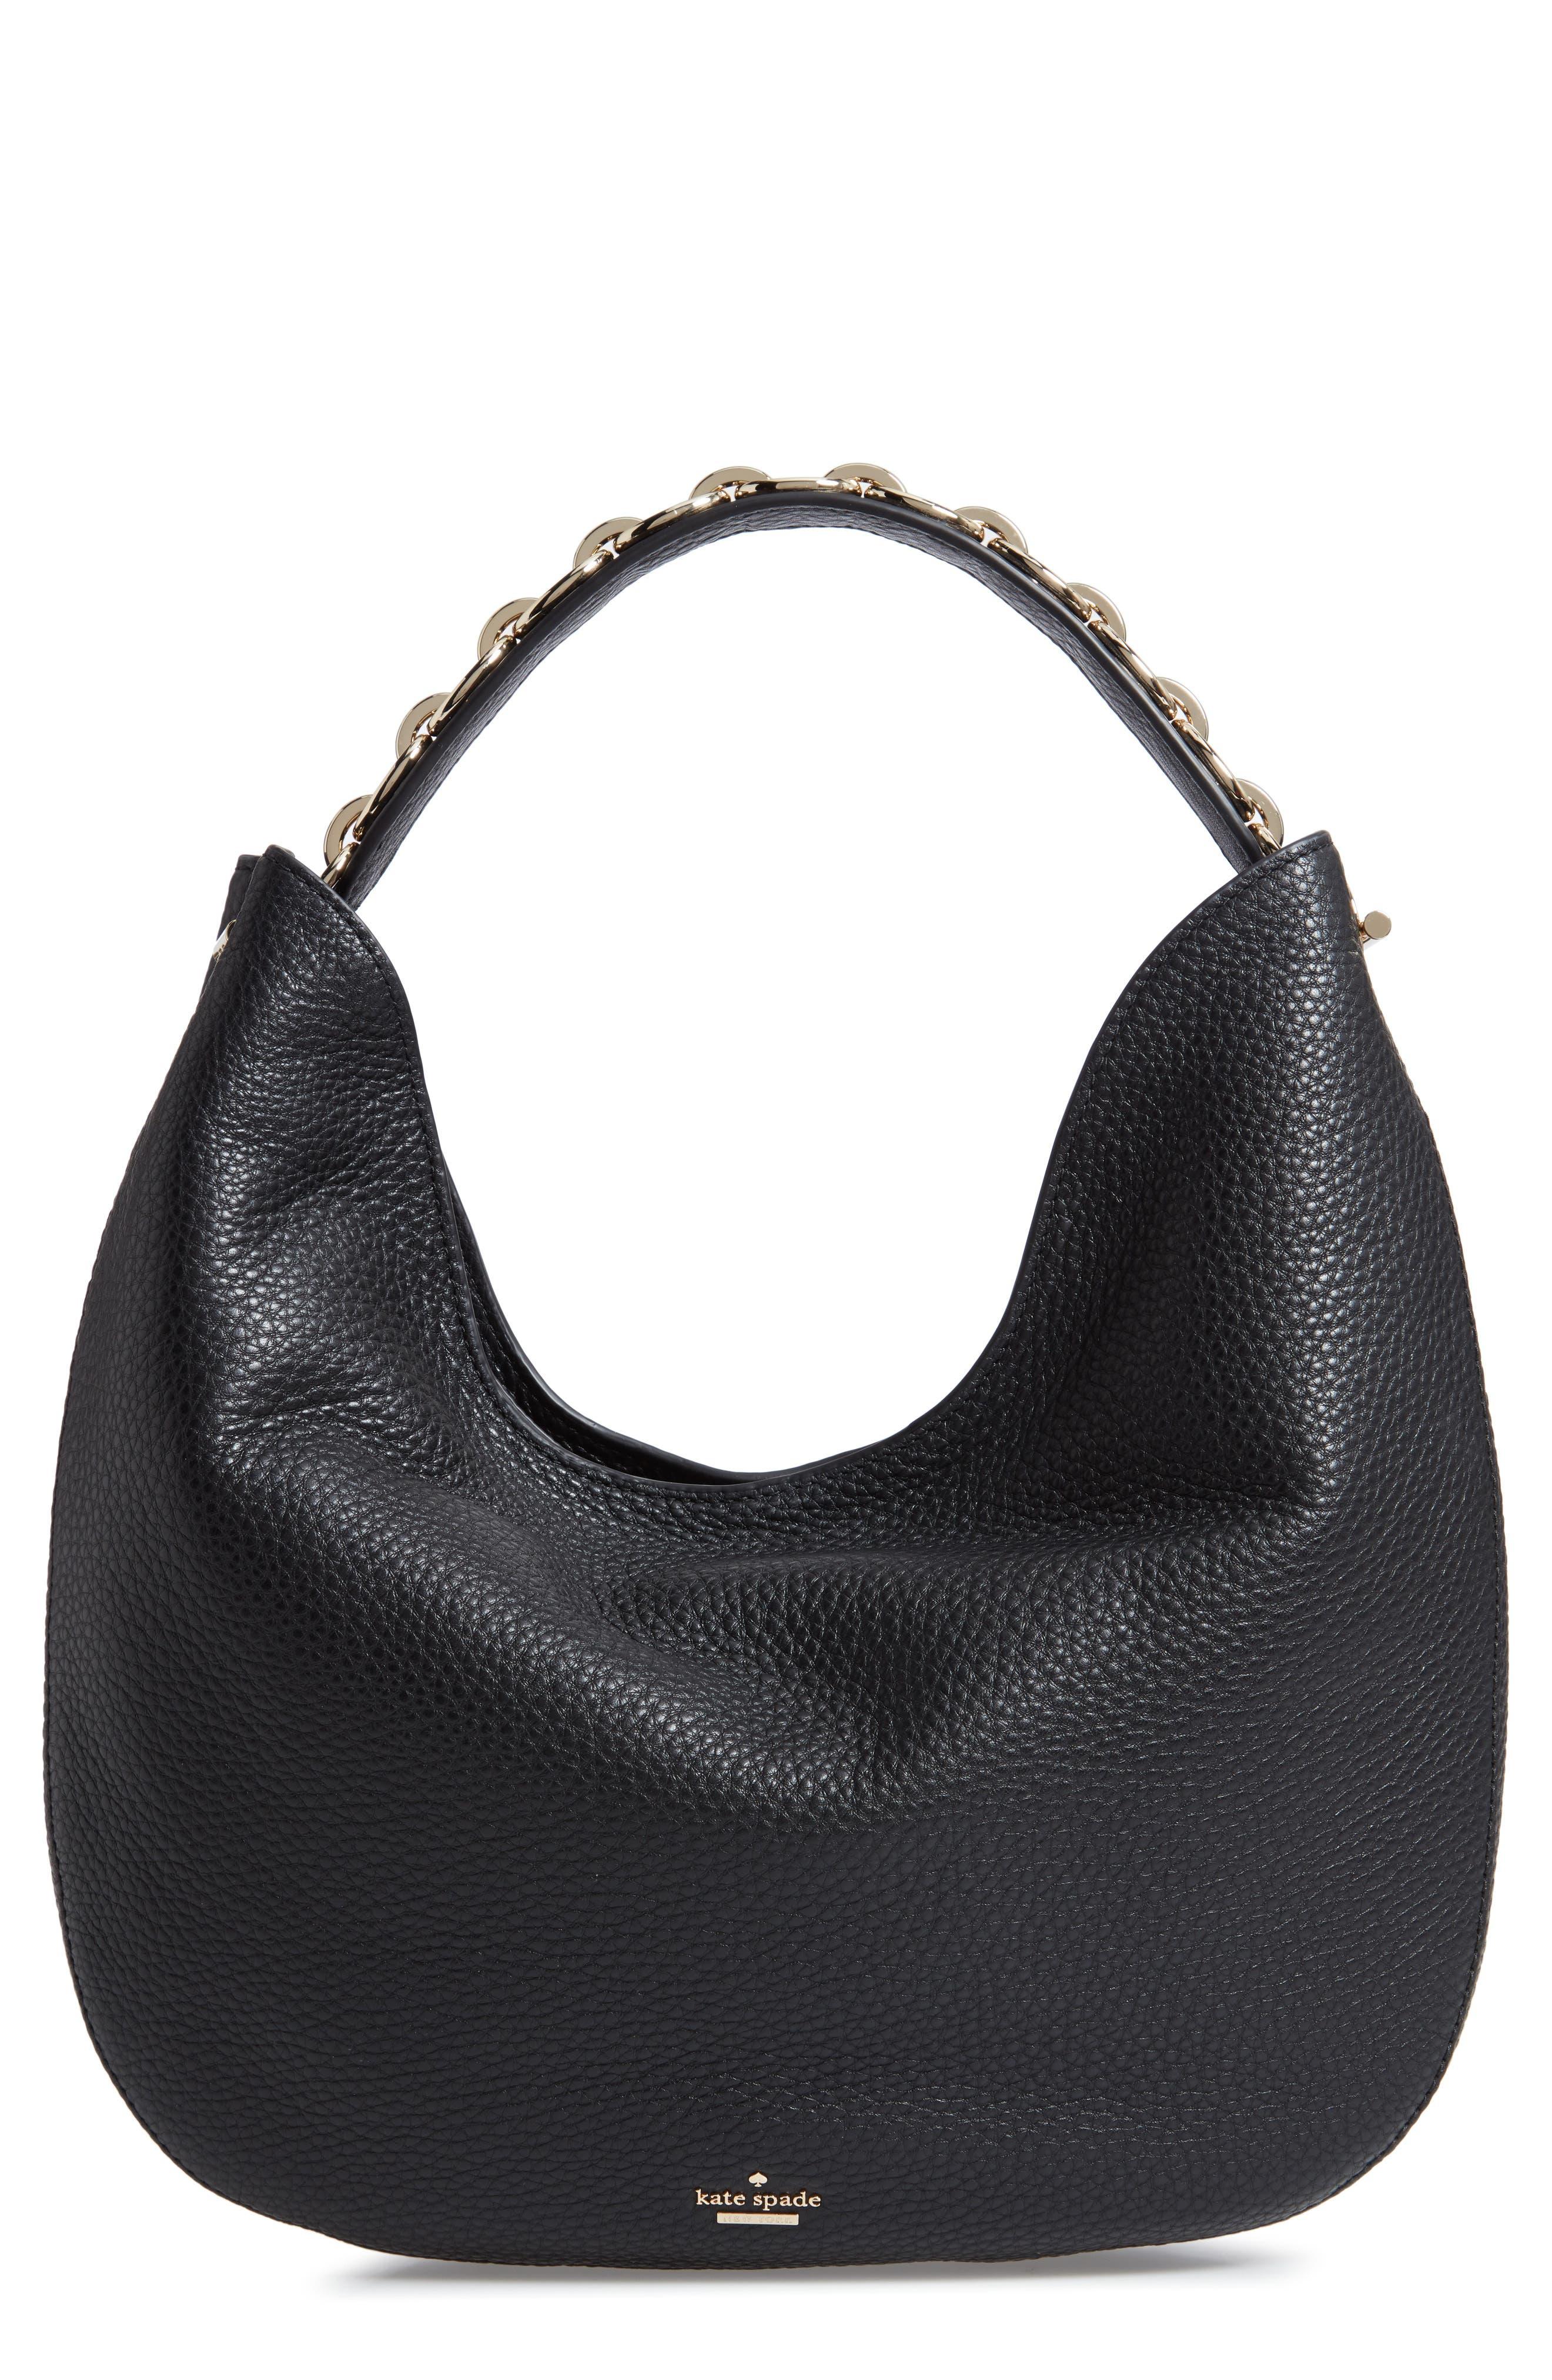 murray street heather pebbled leather hobo bag,                             Main thumbnail 1, color,                             BLACK